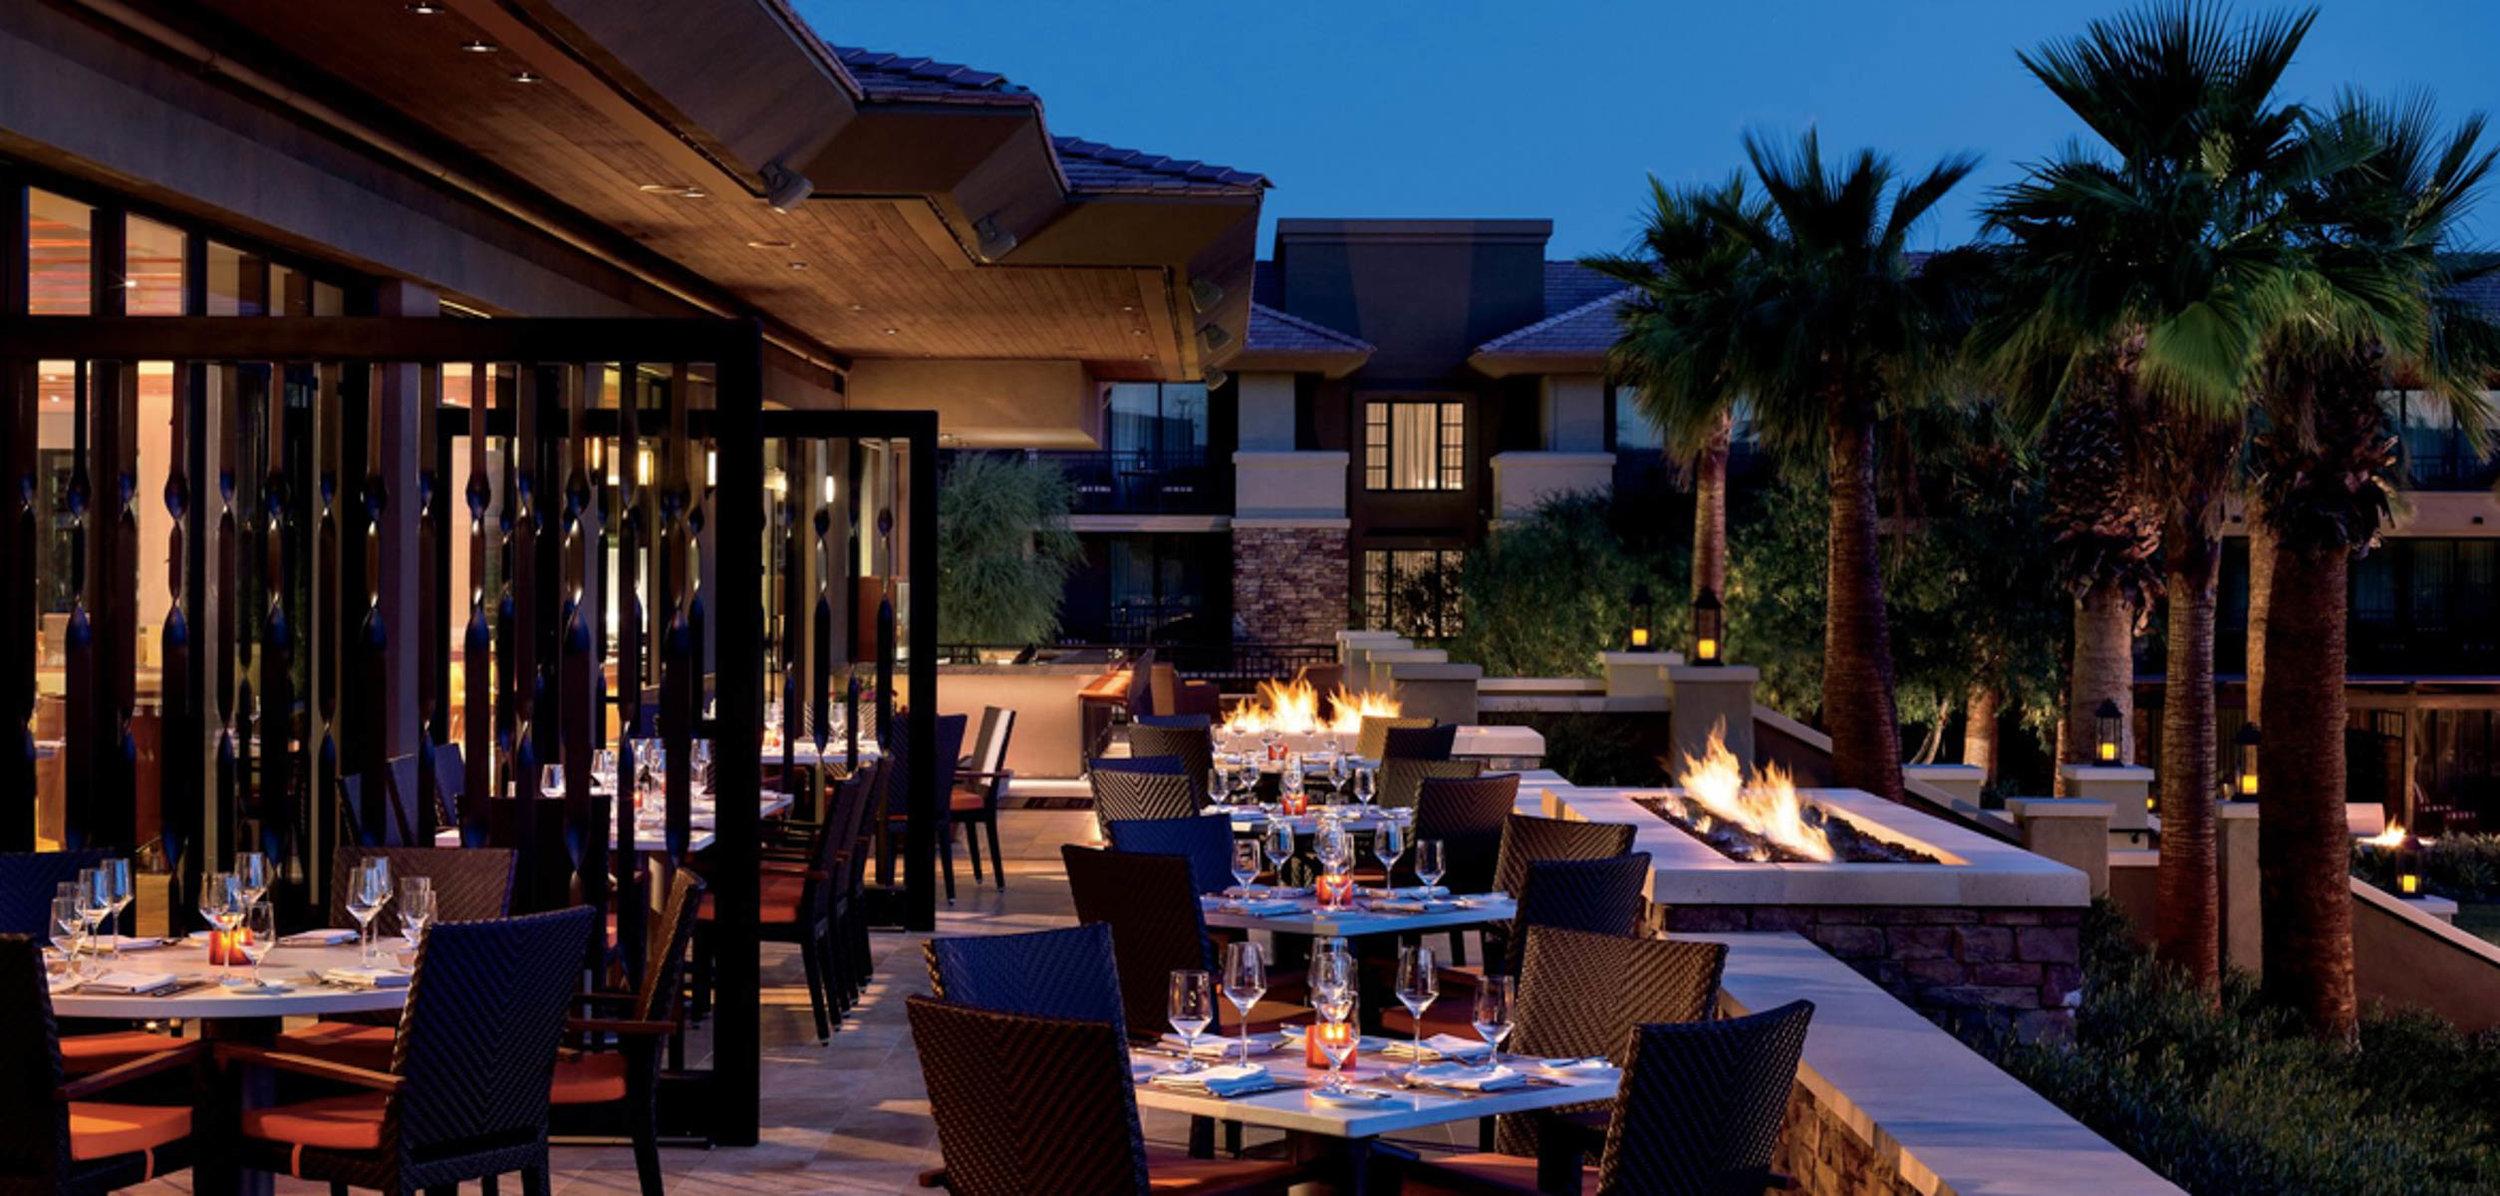 Best Palm Desert Travel Ideas_Palm Desert Hotels_Palm Desert_resorts_Addie Bell-18.jpg